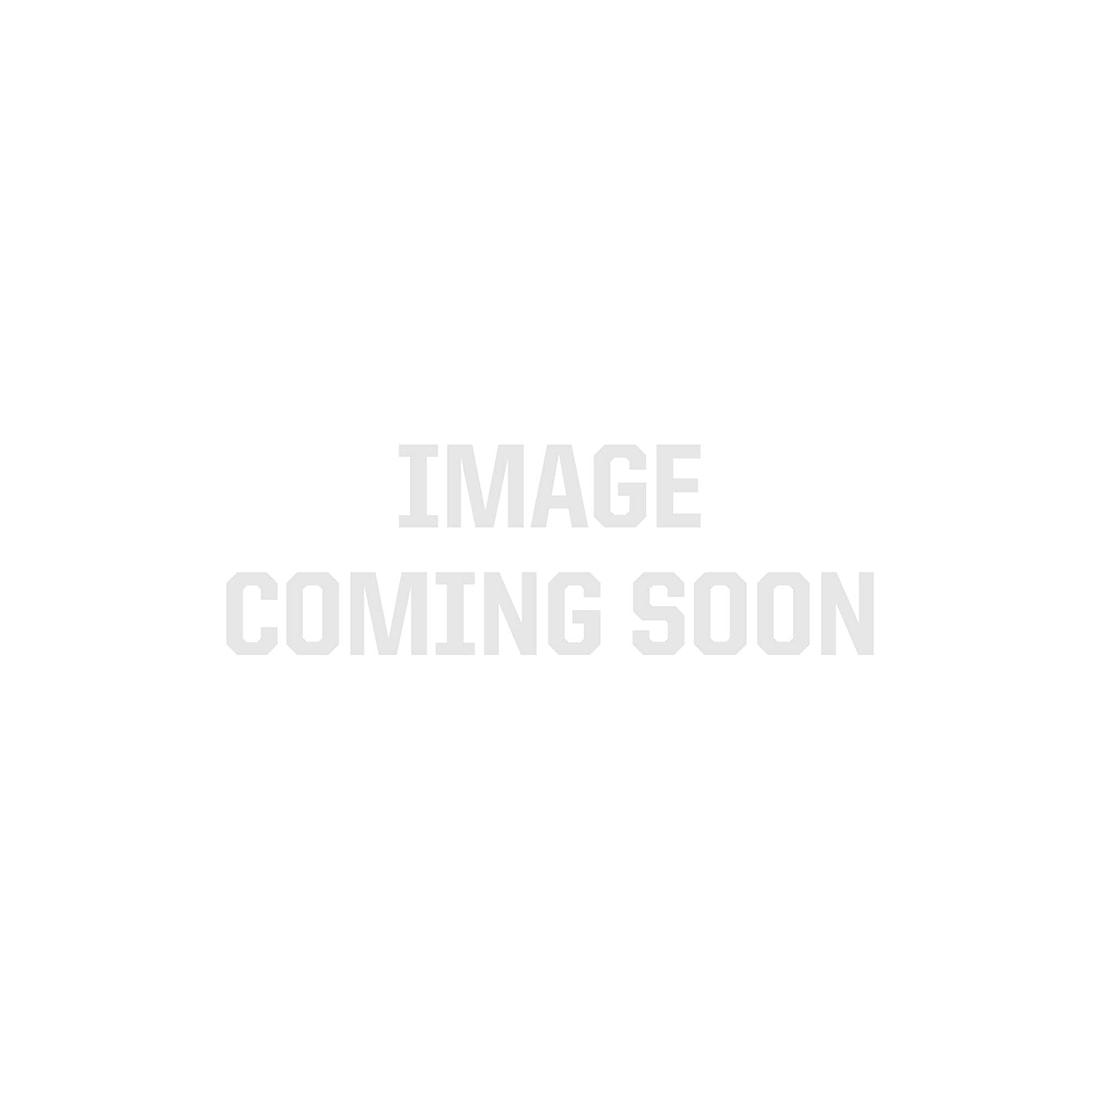 S14 Clear Glass Dimmable LED Light Bulb, E26 (Medium) Base, 1.4 watt (Extreme Warm White)